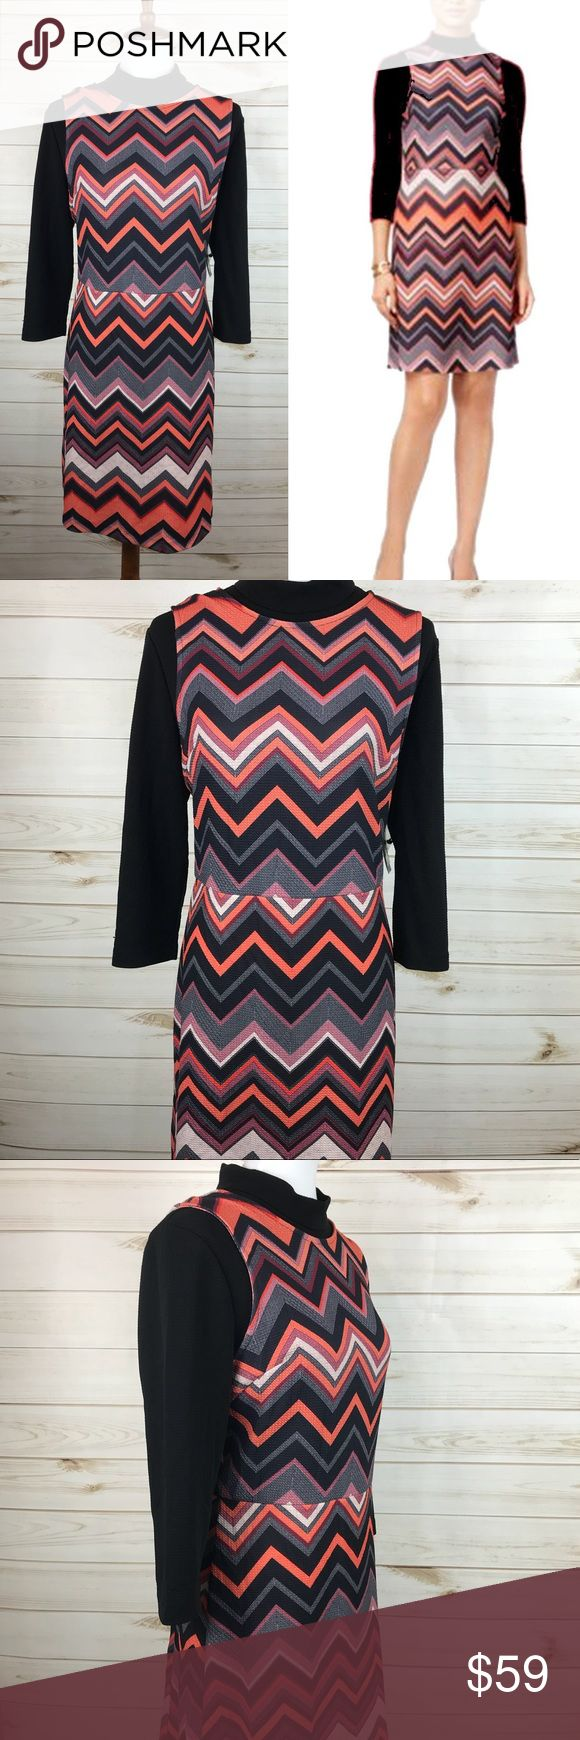 ECI New York Chevron Dress NWT - Black/Orange Never Worn Dress - Great Condition ECI Dresses